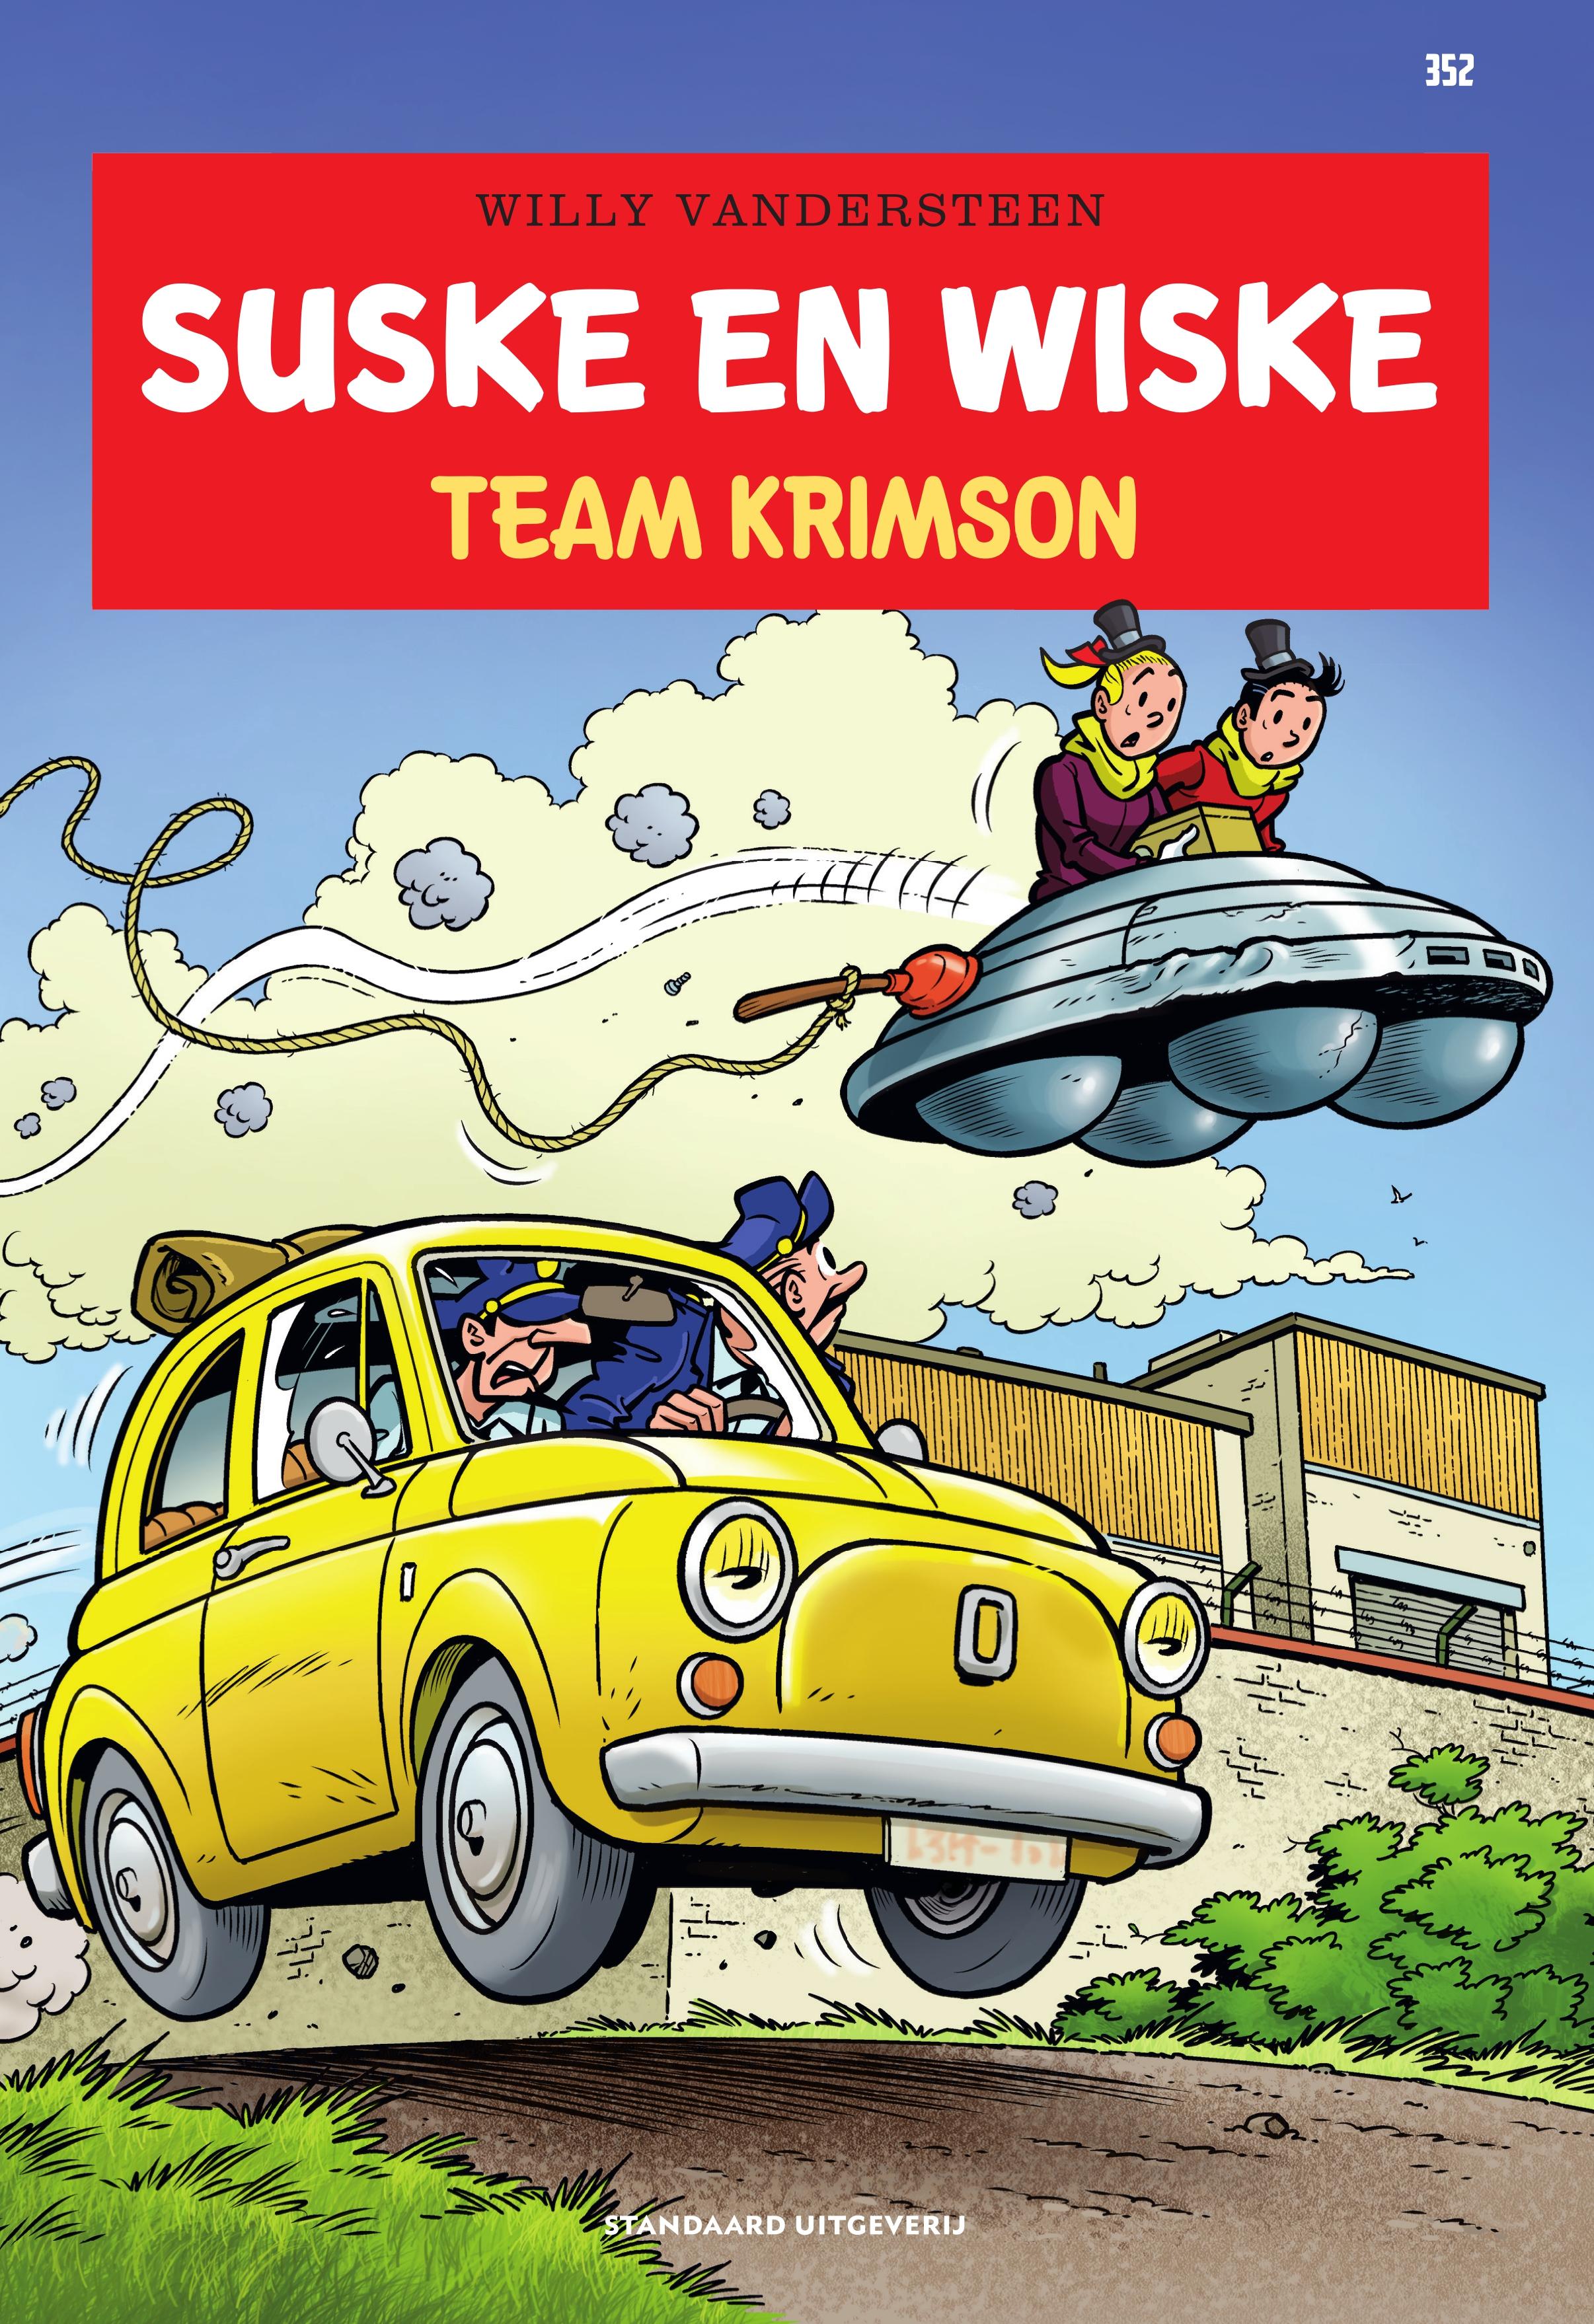 352 Team Krimson